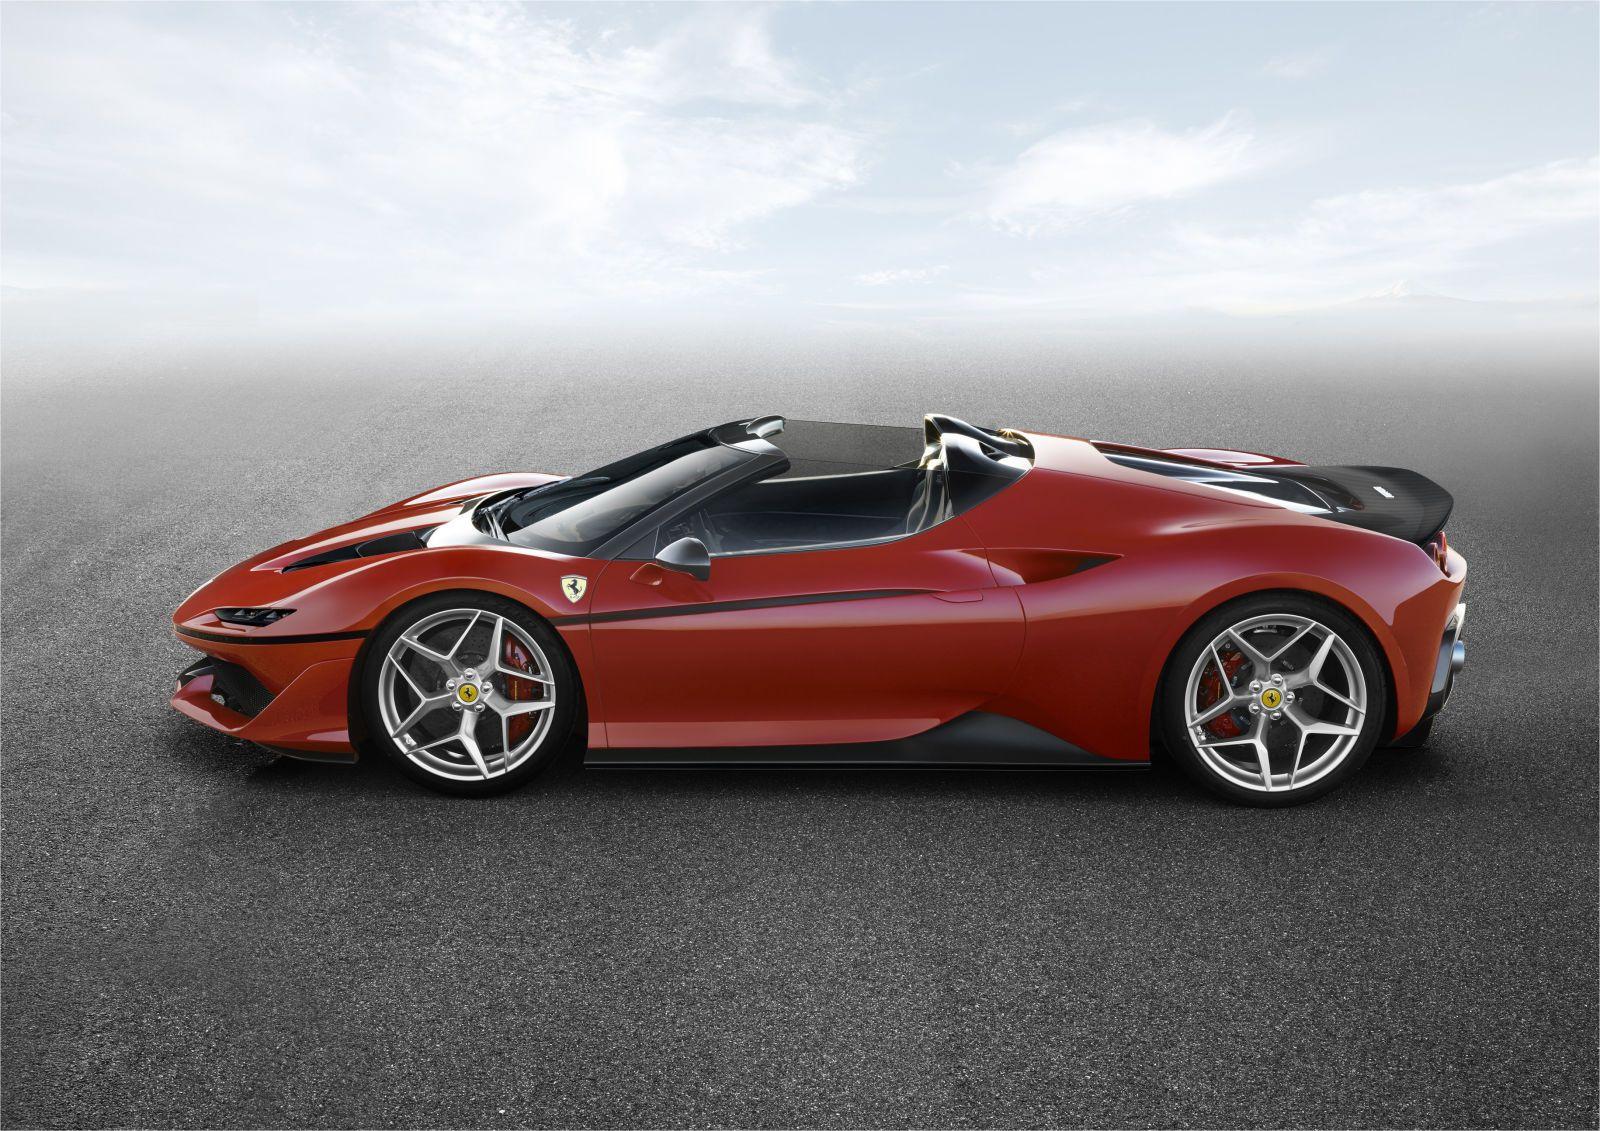 The J50 Is Ferrari S Latest Ultra Limited Supercar Ferrari Car Bespoke Cars Super Cars